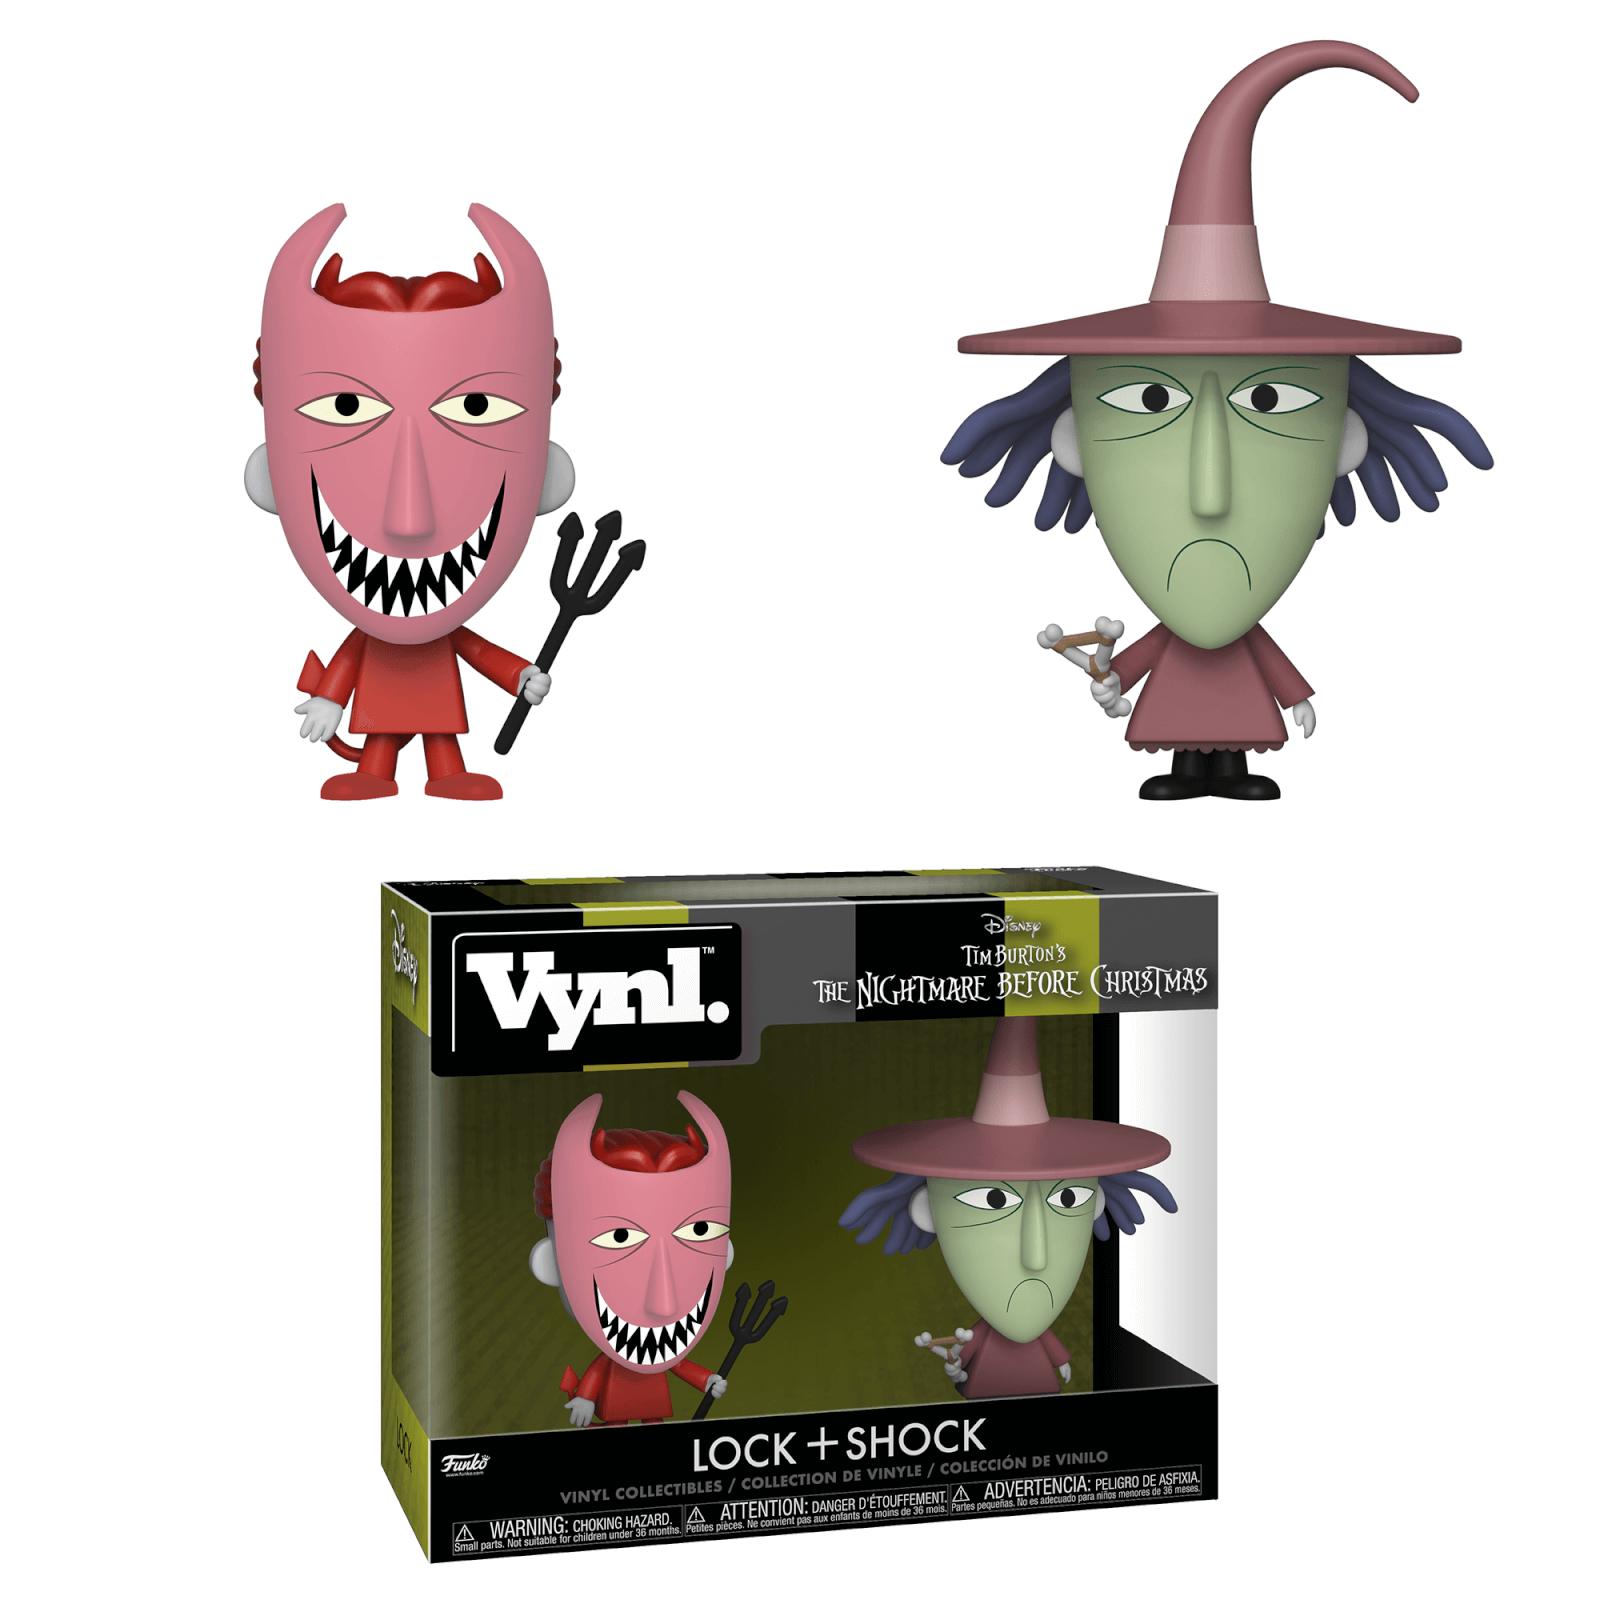 Nightmare Before Christmas Lock and Shock Vynl. | My Geek Box US